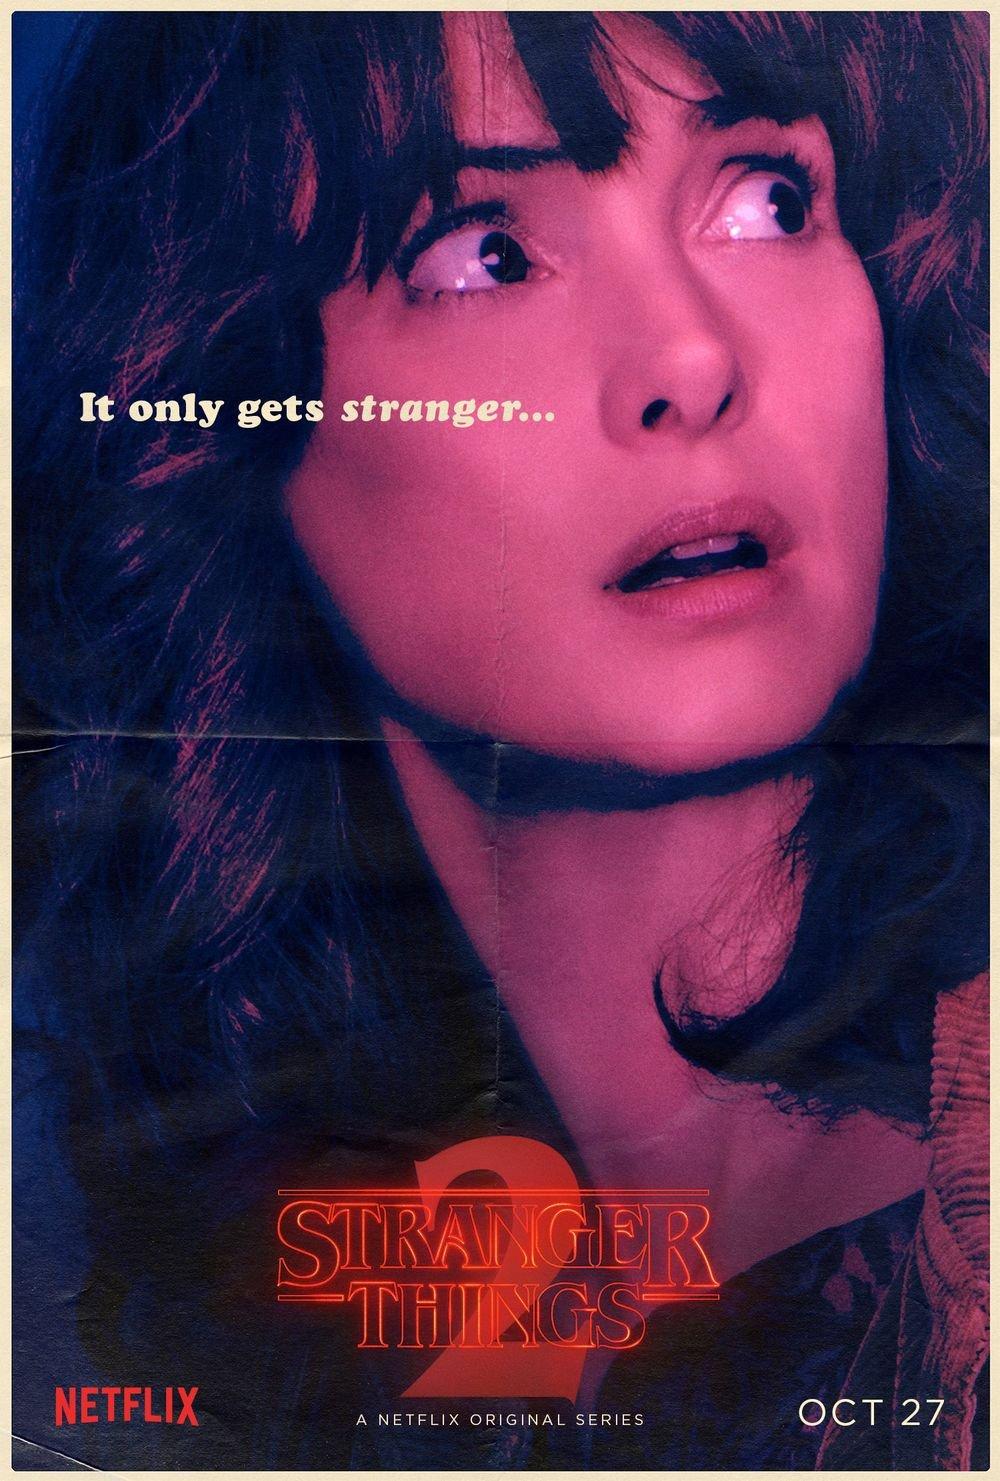 Poster Stranger Things Movie 70 X 45 cm: Amazon.es: Hogar